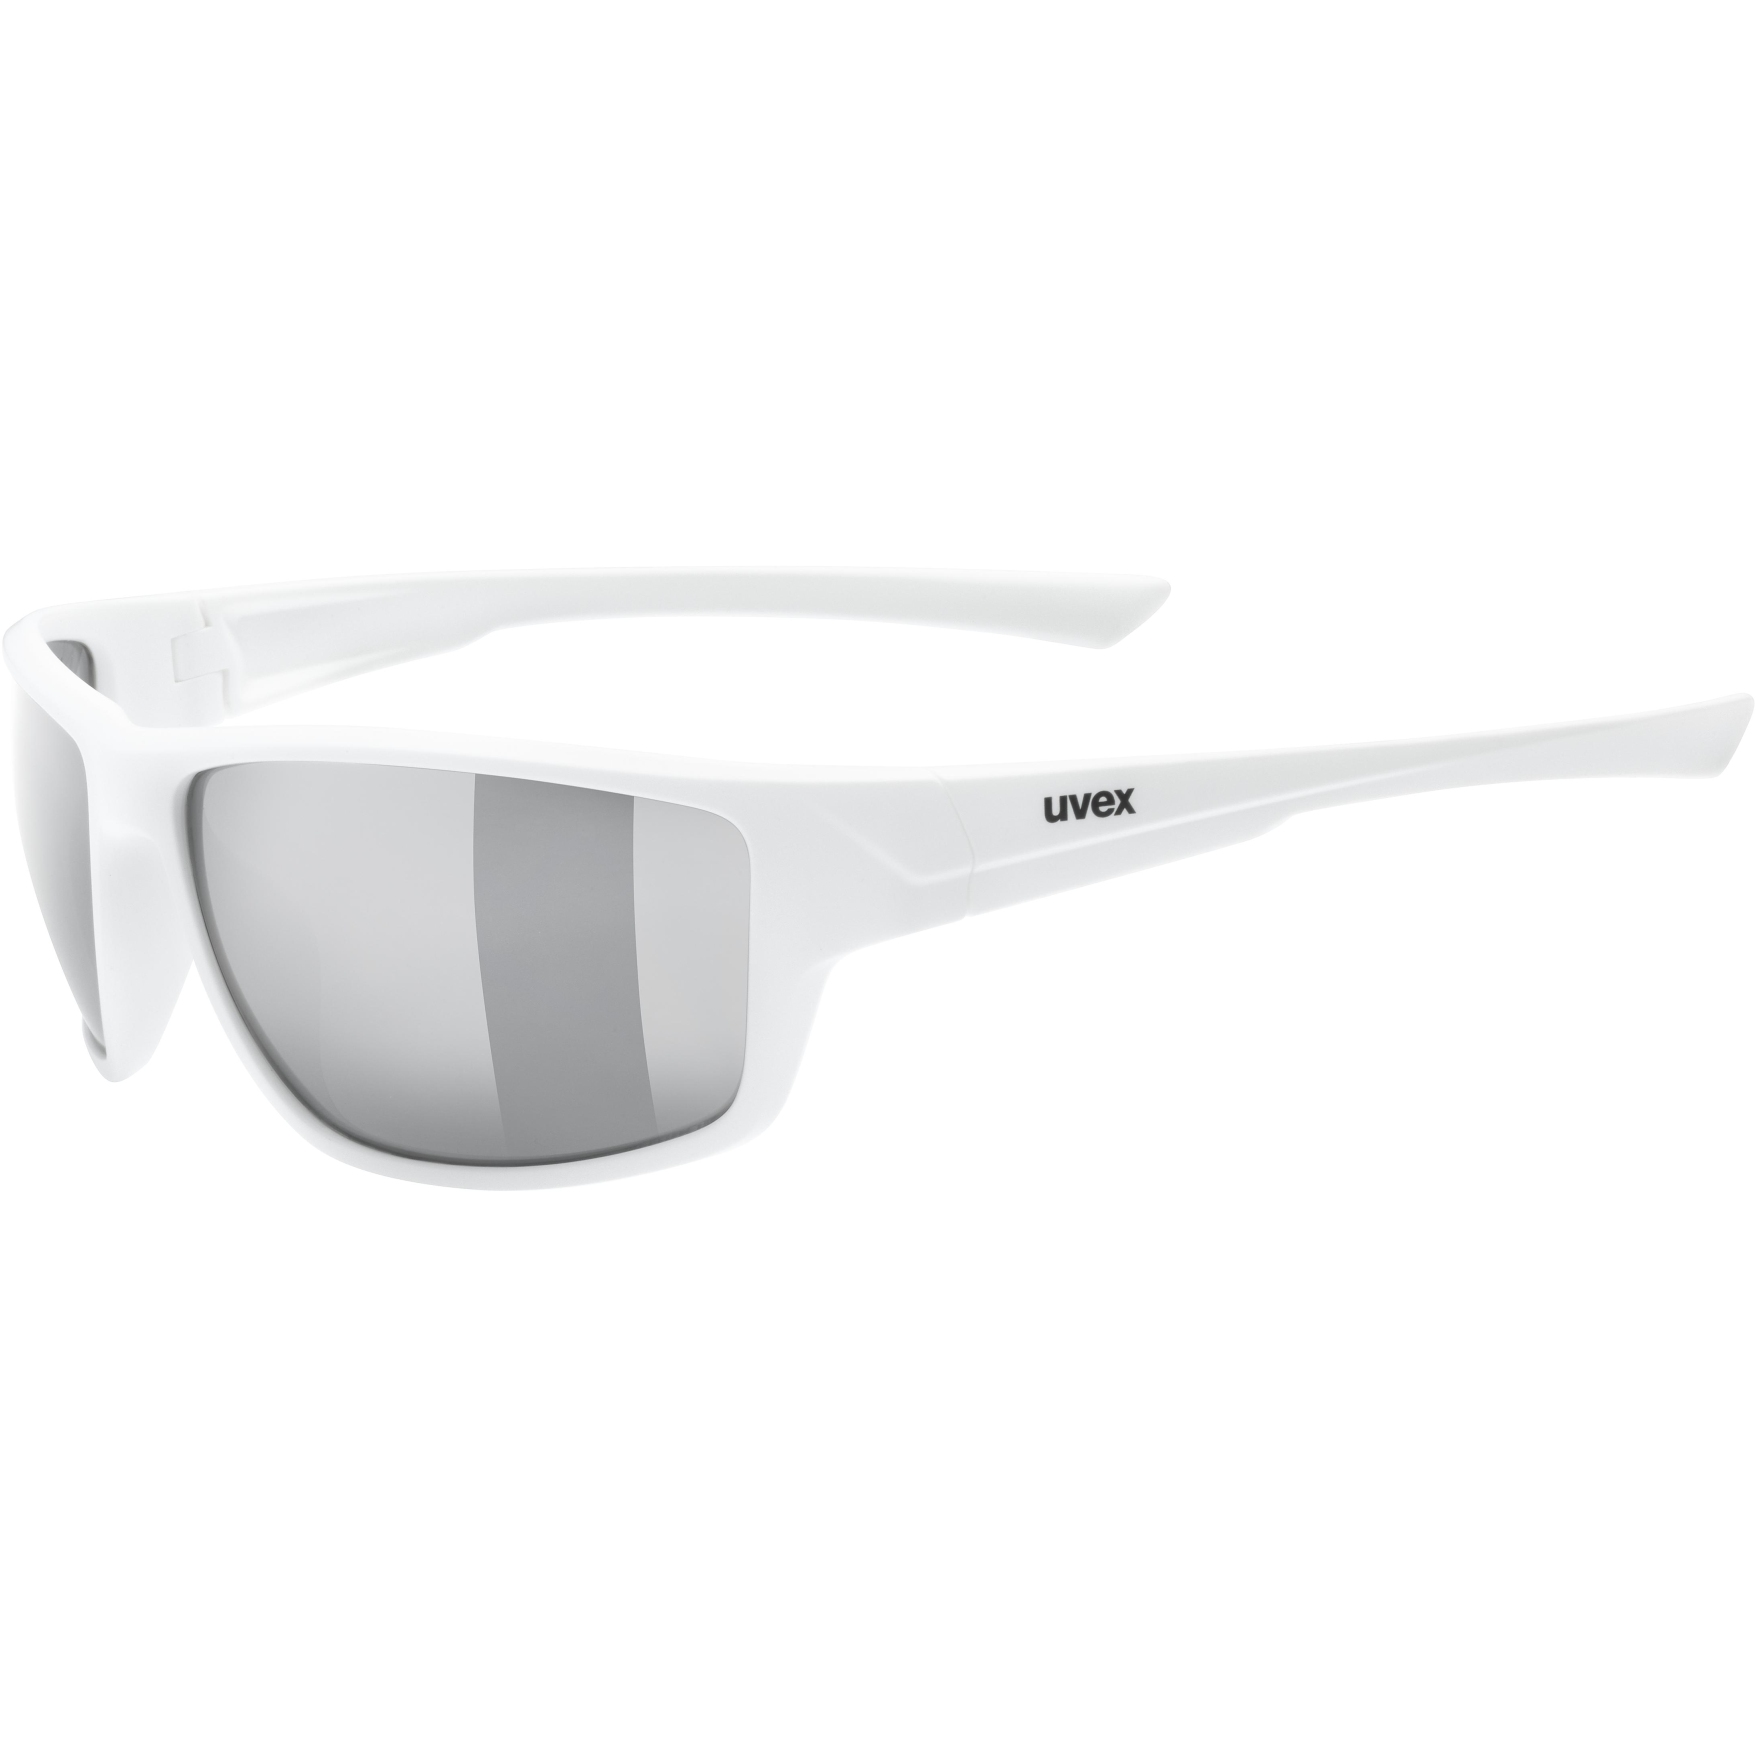 Uvex sportstyle 230 Glasses - white mat/litemirror silver